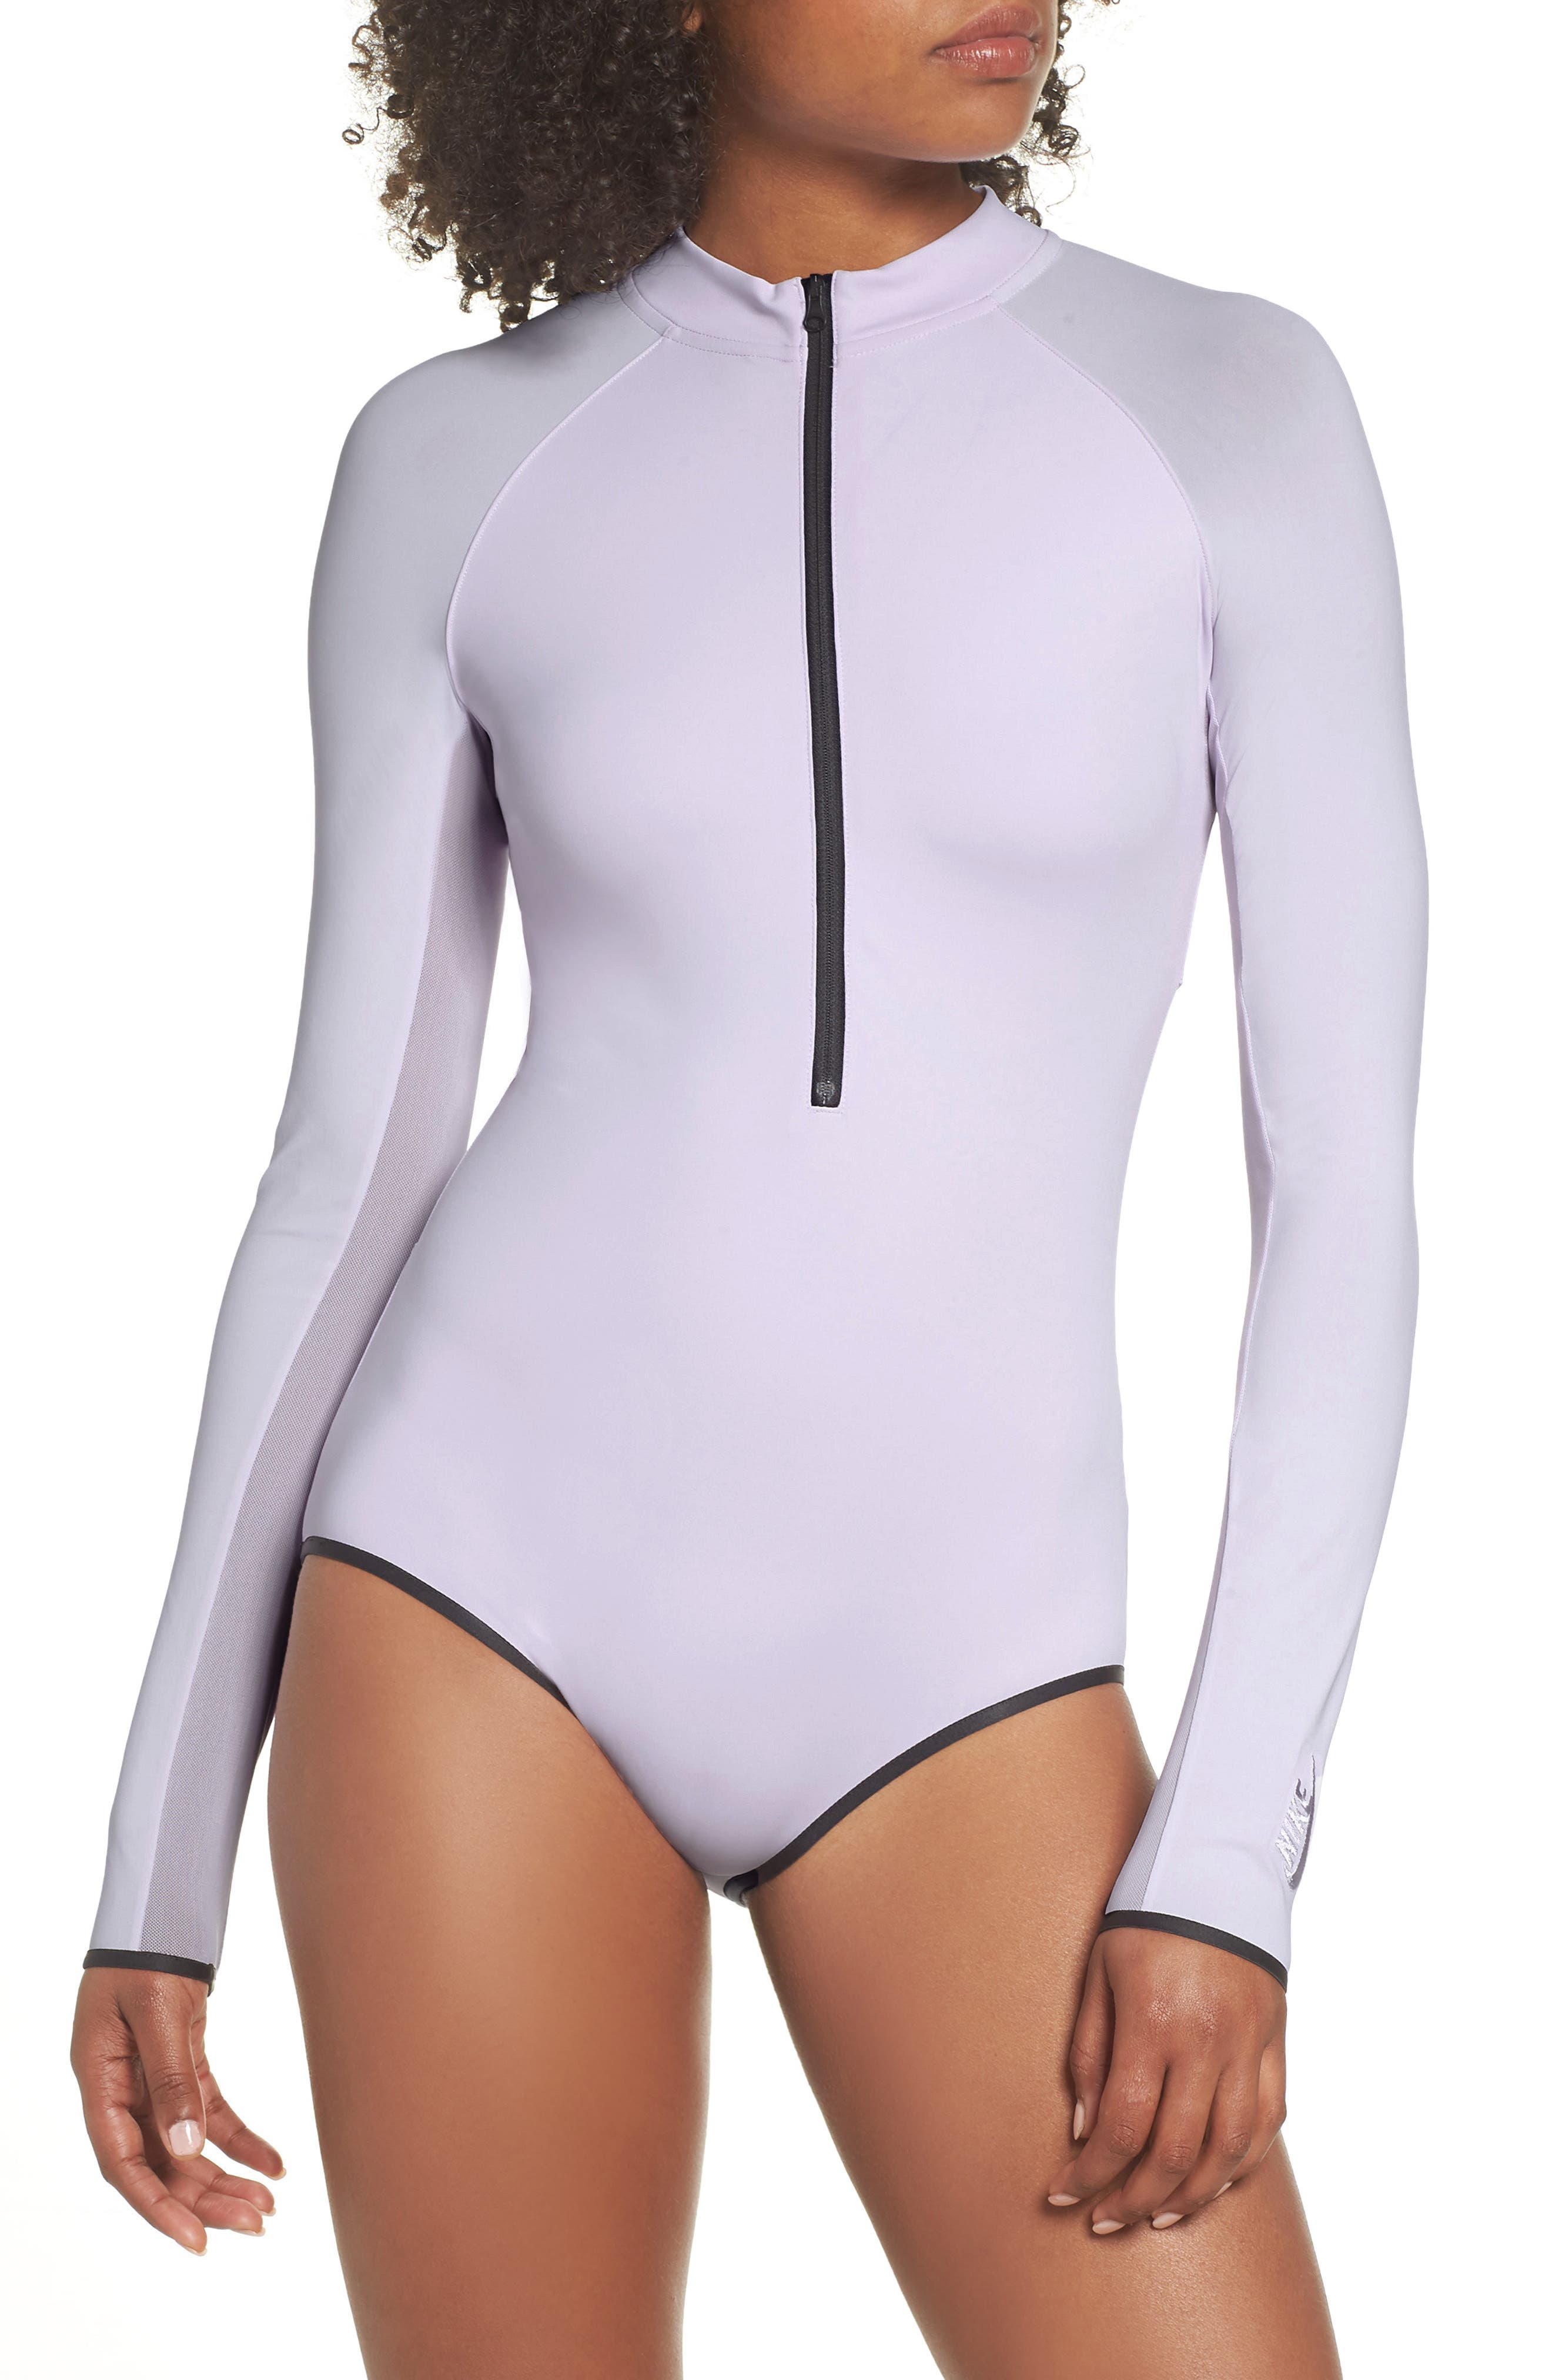 NRG Women's Dri-FIT Long Sleeve Bodysuit,                         Main,                         color, BARELY GRAPE/ BARELY GRAPE